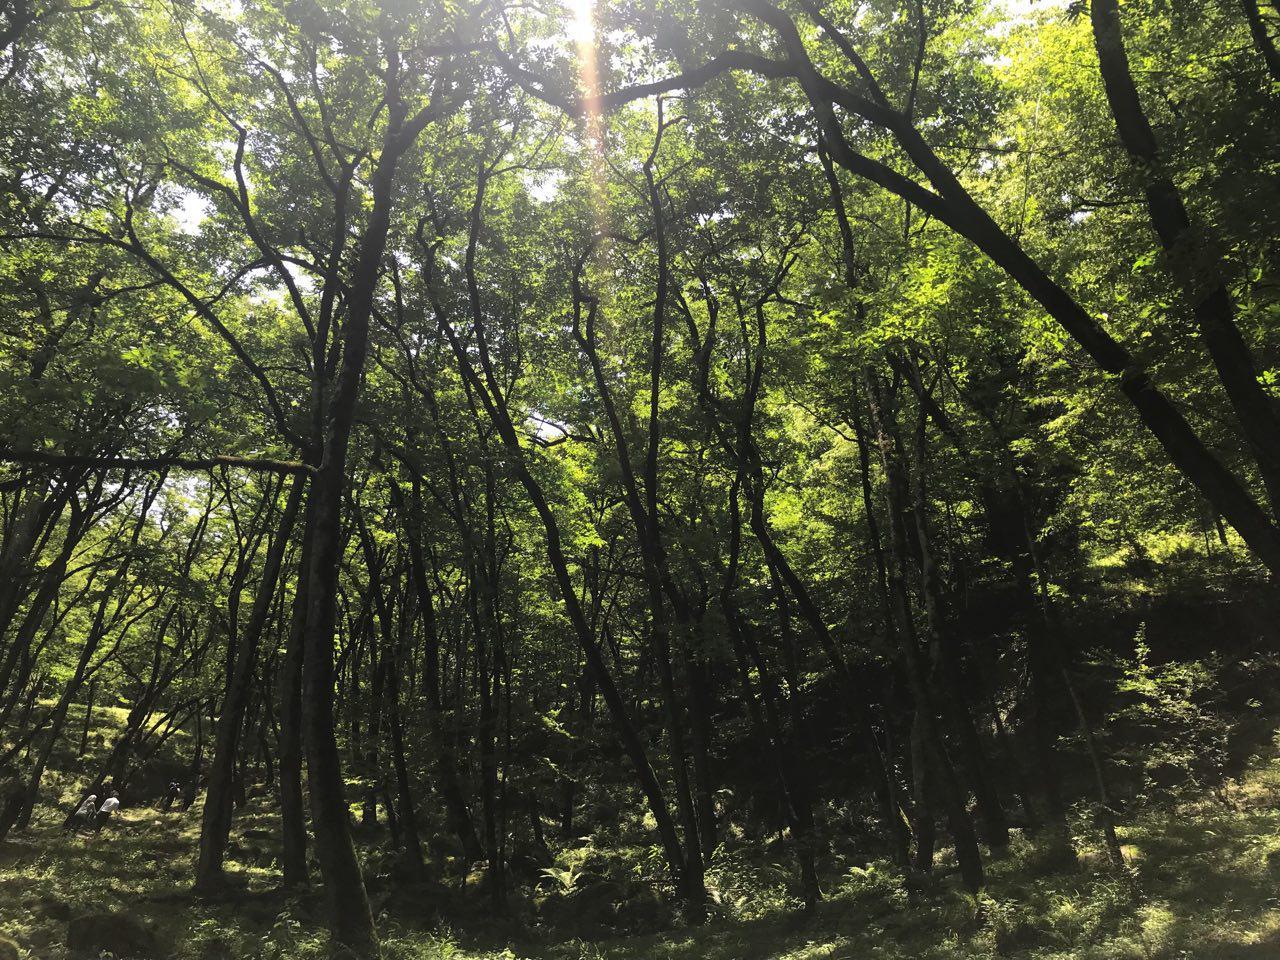 سفر به جنگل لفور؛ طراوت رو حس کن!